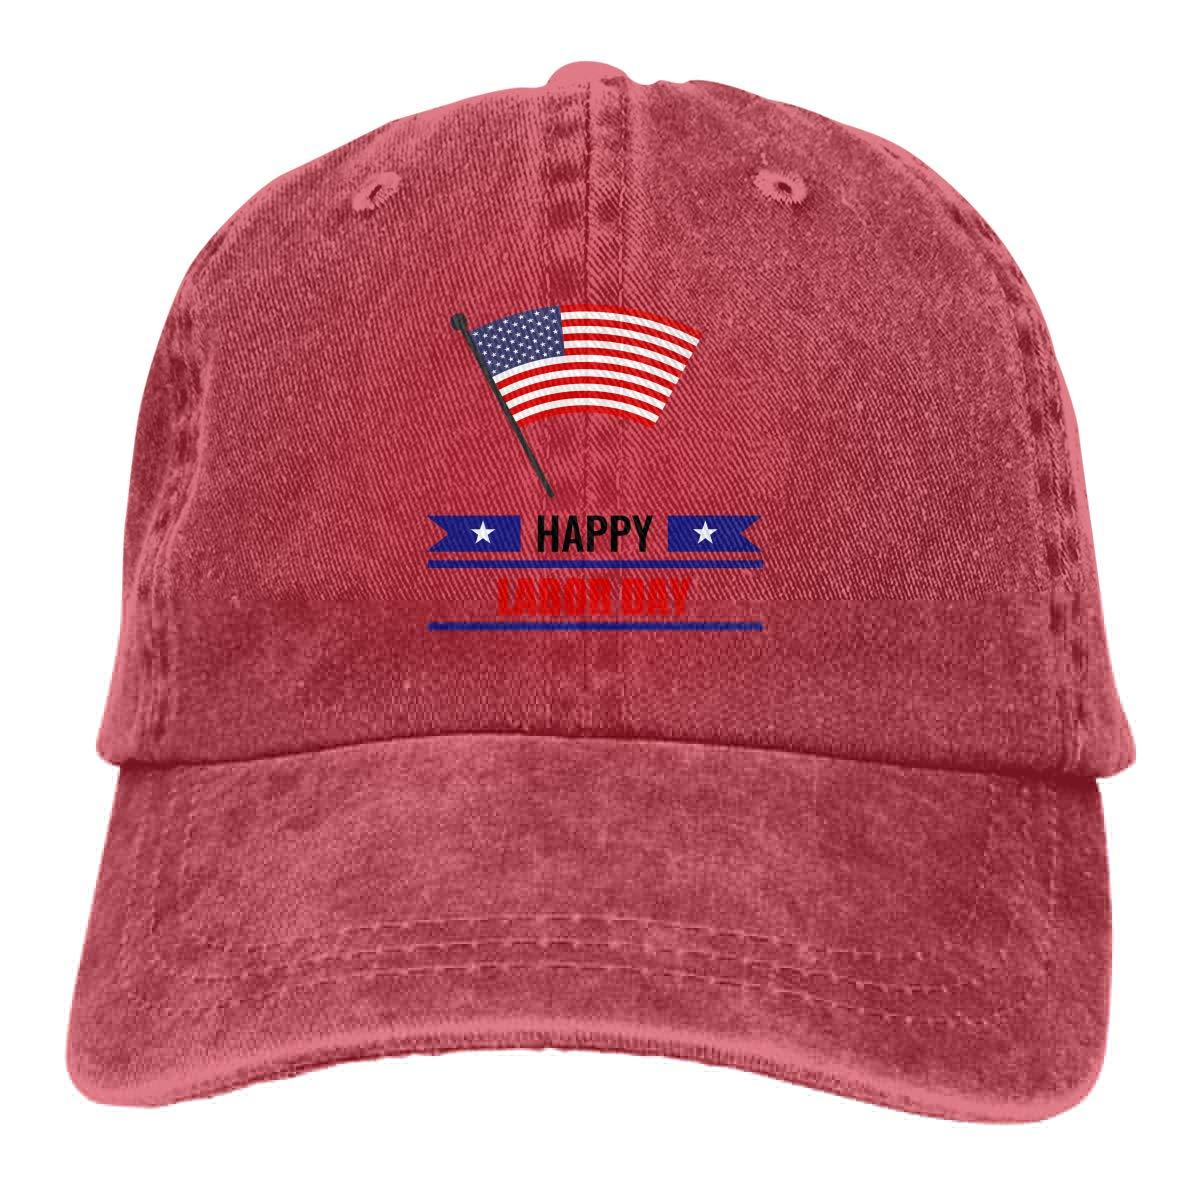 Cotton Hats Amayc Adjustable Mens Denim Baseball Caps Us Flag Happy Labor Day3 Funny